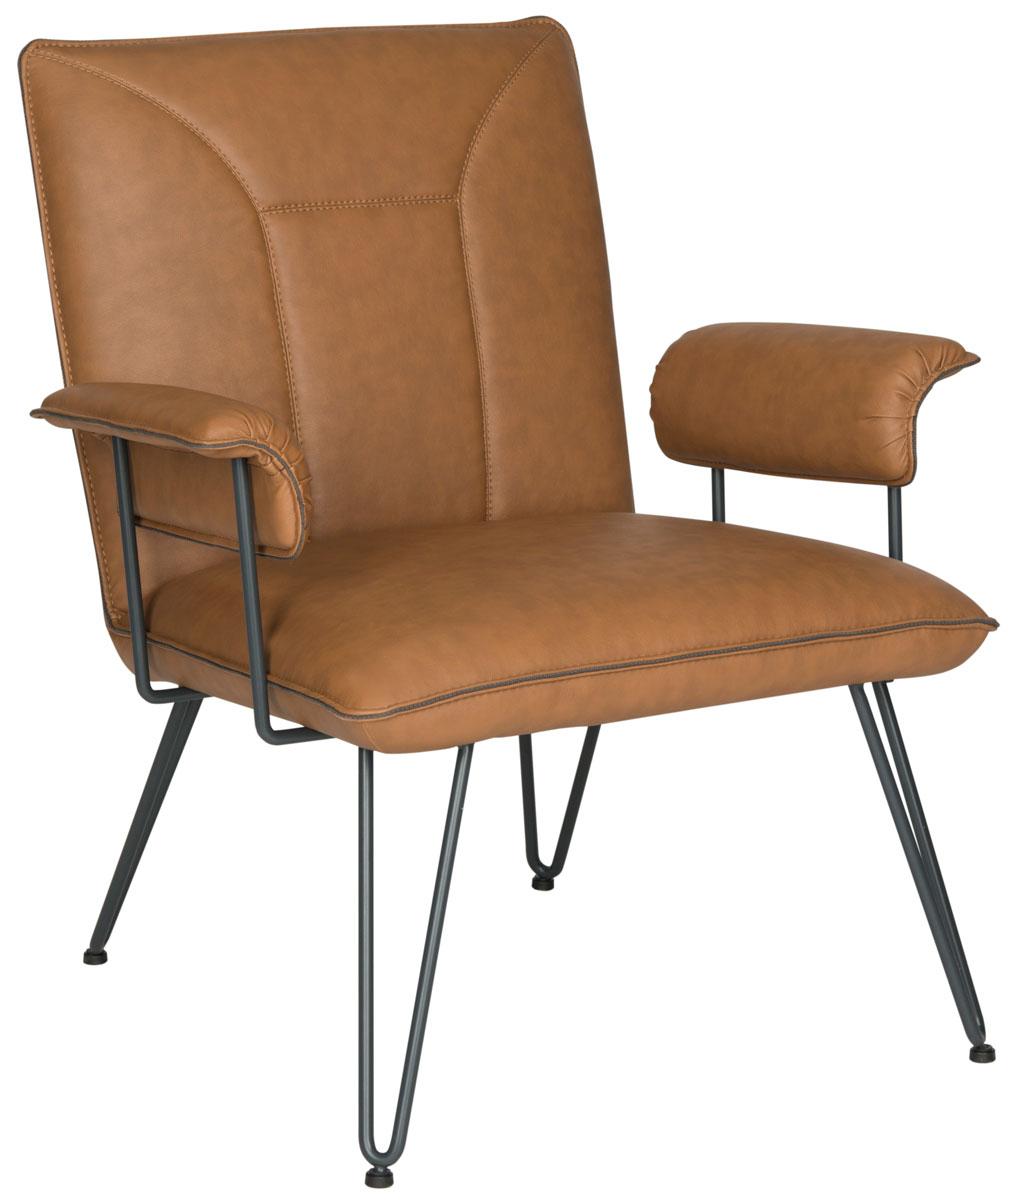 Fullsize Of Leather Chair Mid Century